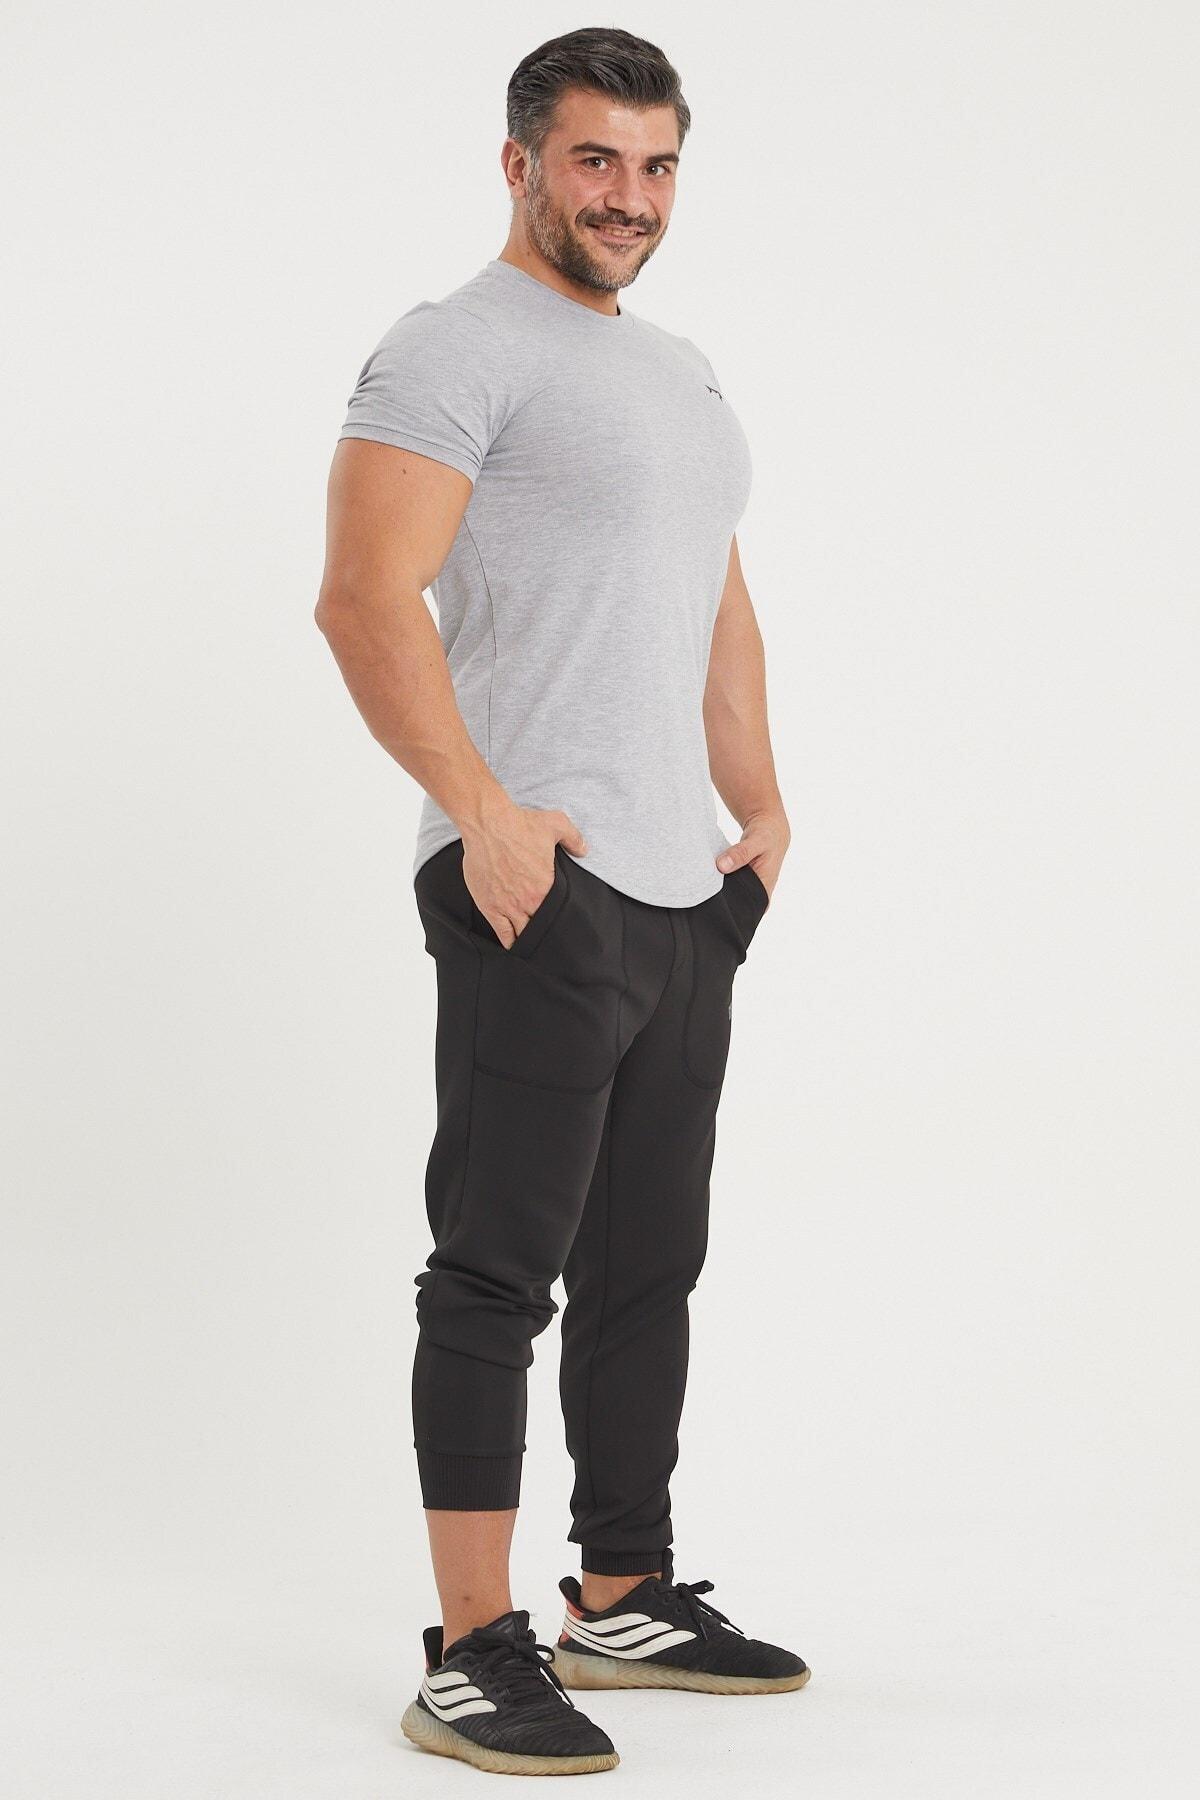 Gymwolves Spor Erkek T-shirt   Gri   T-shirt   Workout Tanktop   2